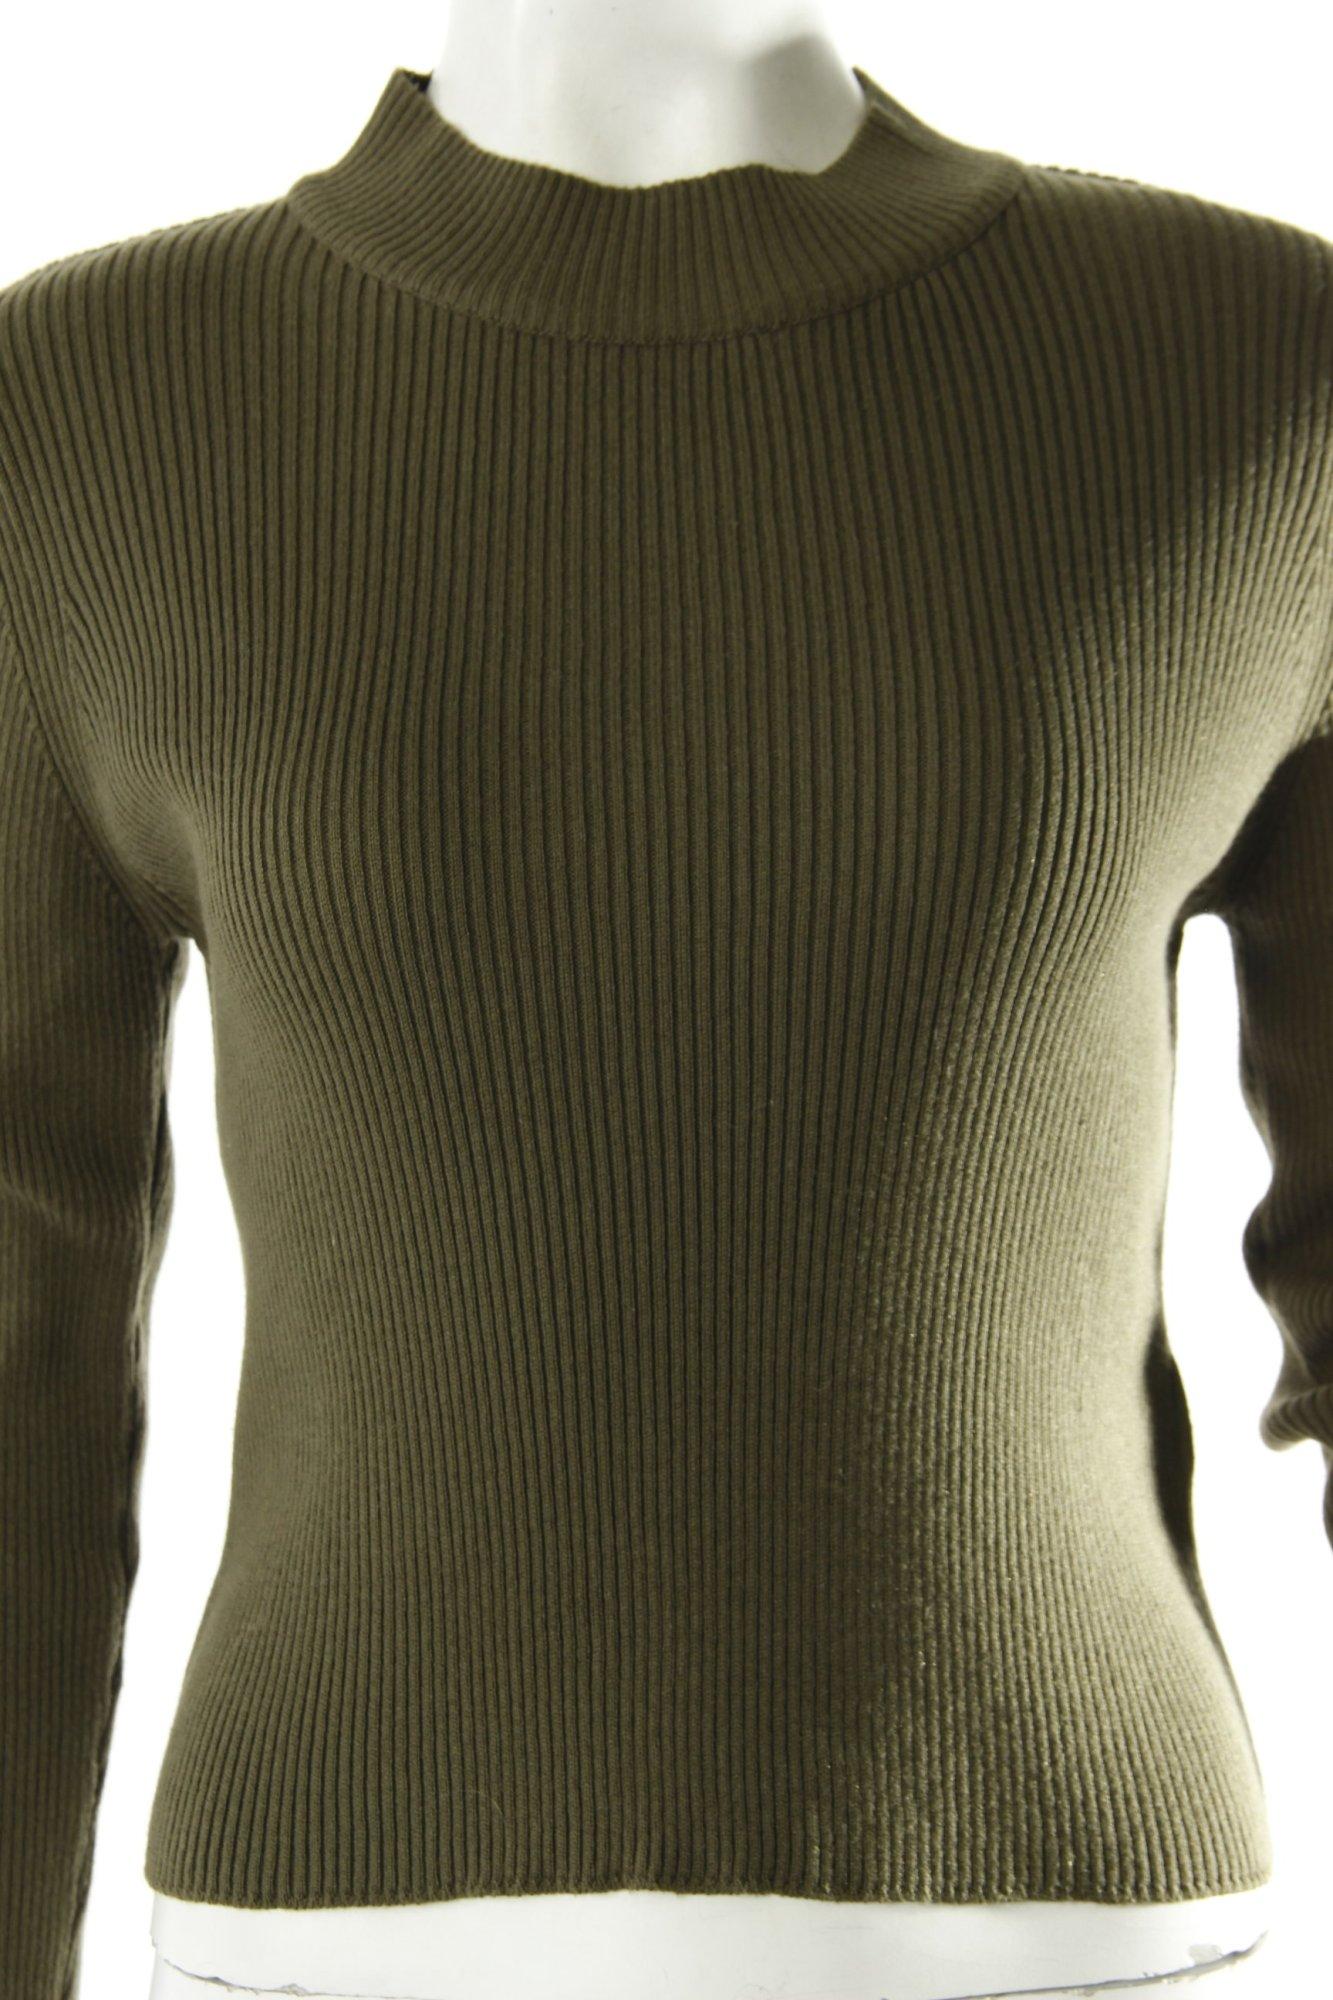 BIK BOK Cropped Pullover mit Rollkragen Damen Gr. DE 36 olivgrün Sweater - <span itemprop='availableAtOrFrom'>Stuttgart, Deutschland</span> - Vollständige Widerrufsbelehrung Rücknahme akzeptiert. Innerhalb Deutschland für Käufer kostenlos. - Stuttgart, Deutschland